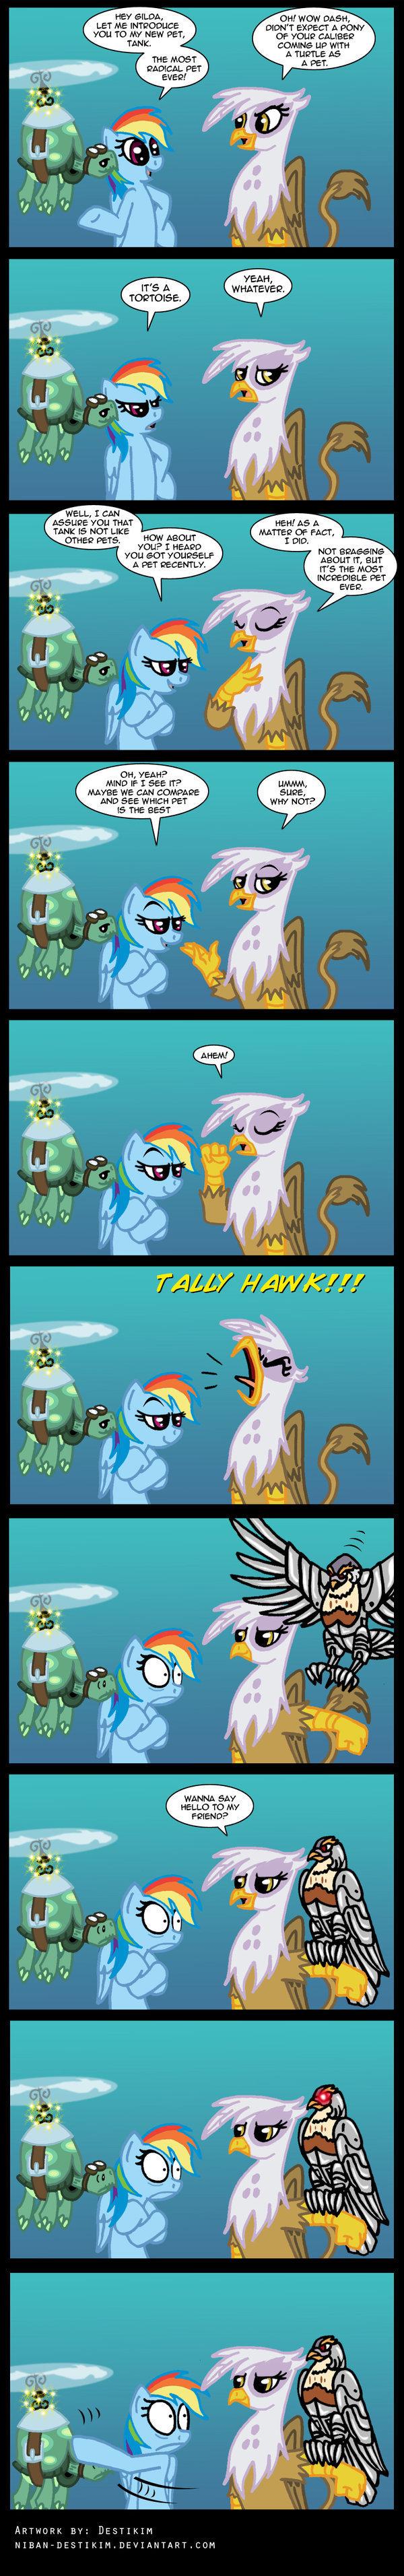 Tally hawk engage!. .. faggot